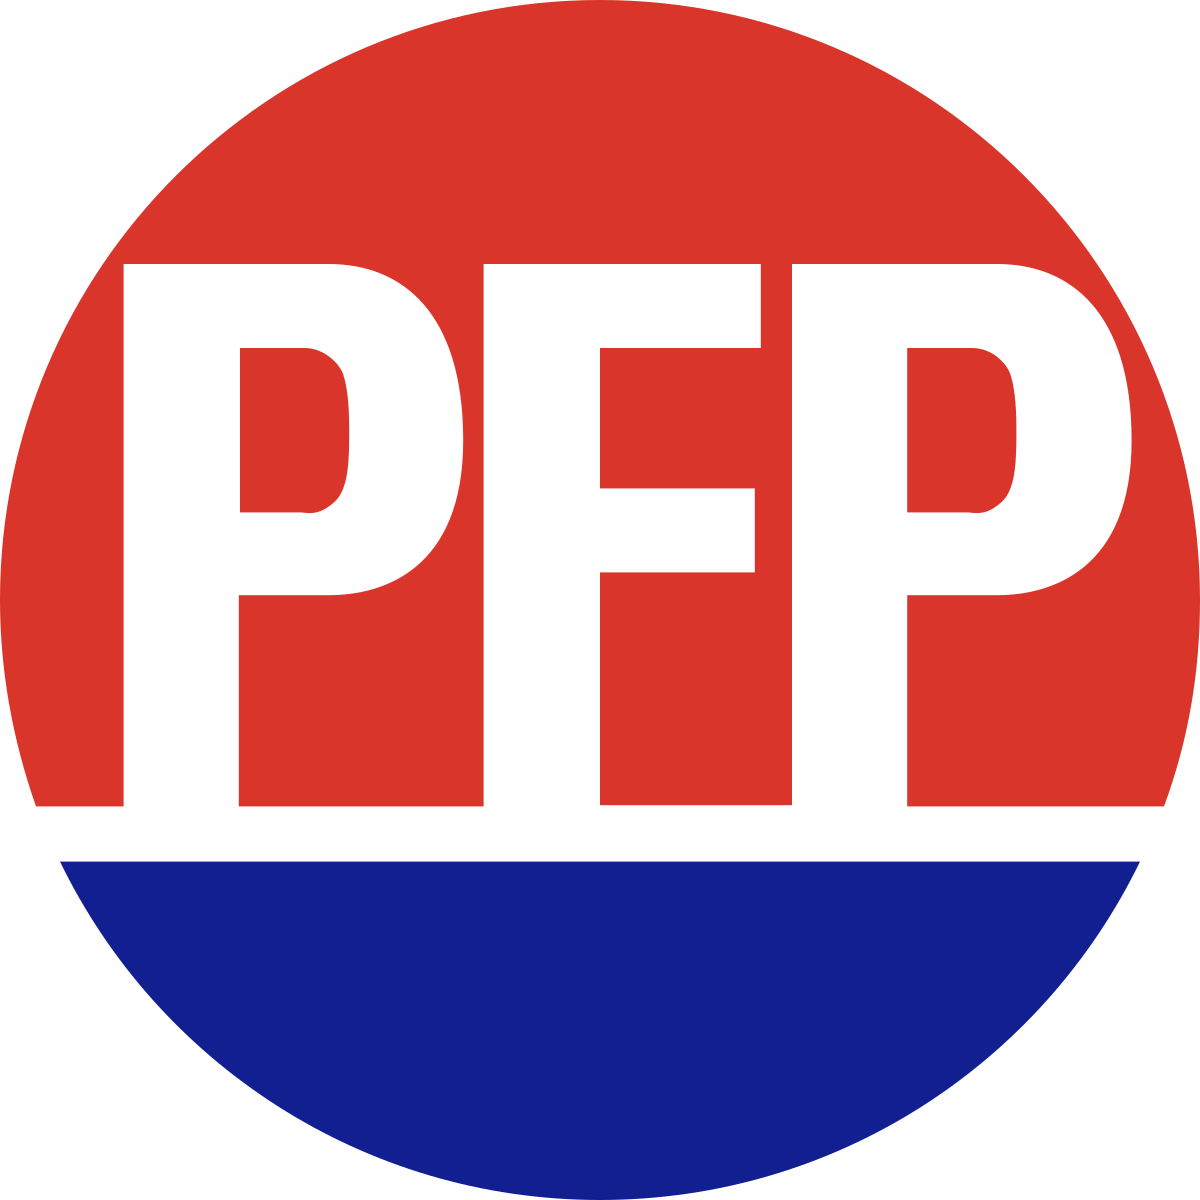 Progressive federal party wikipedia. Torch clipart liberal